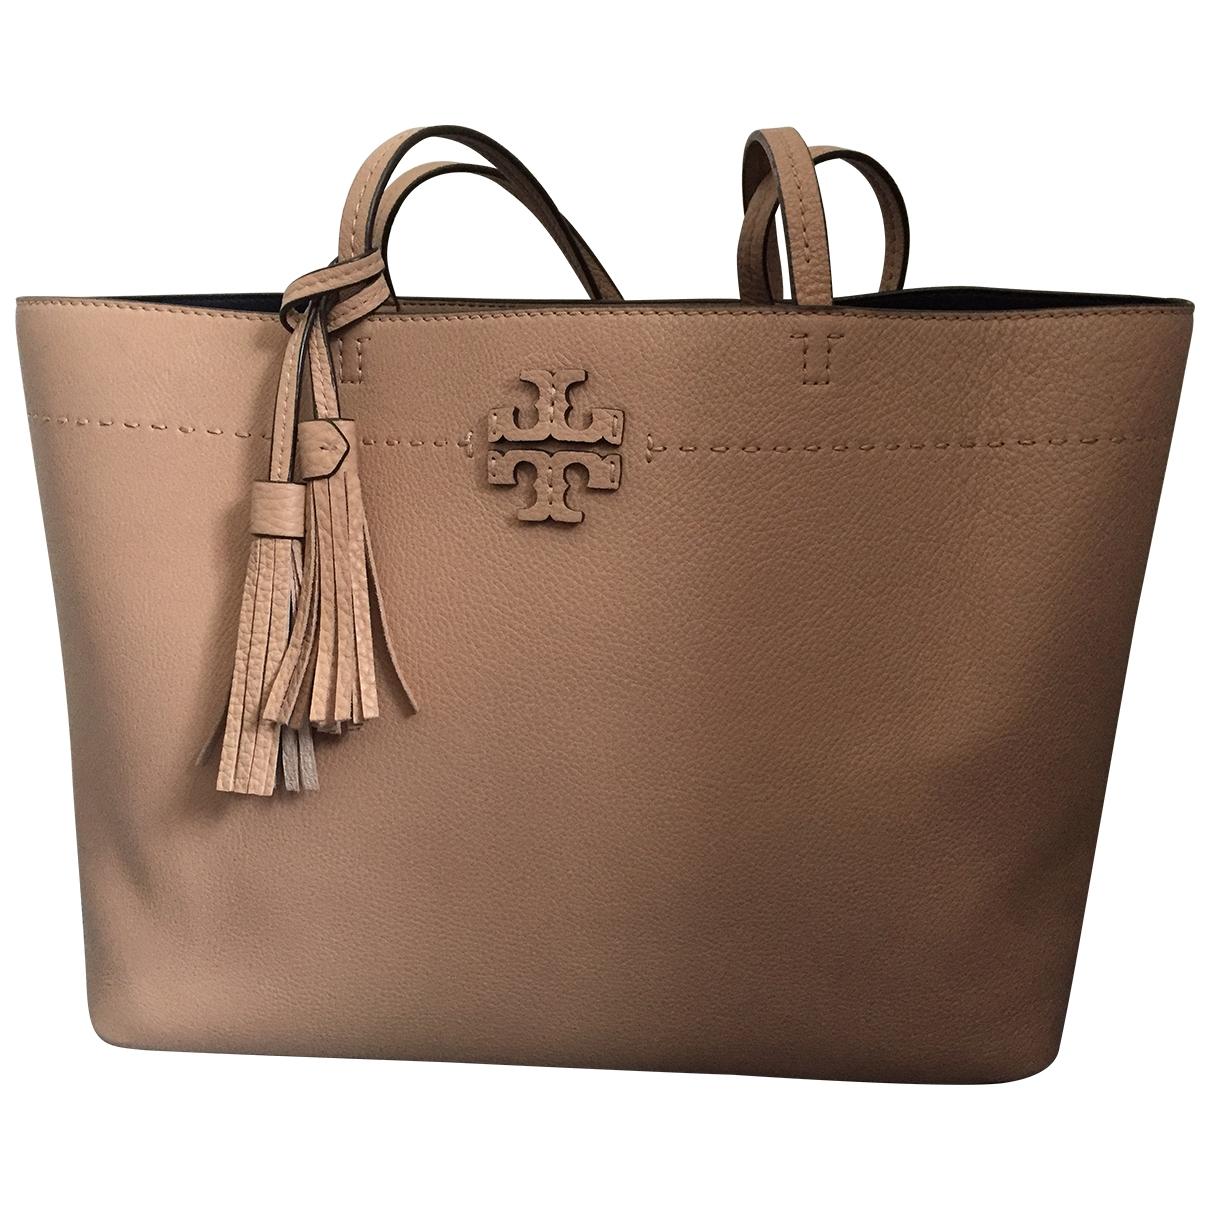 Tory Burch \N Leather handbag for Women \N